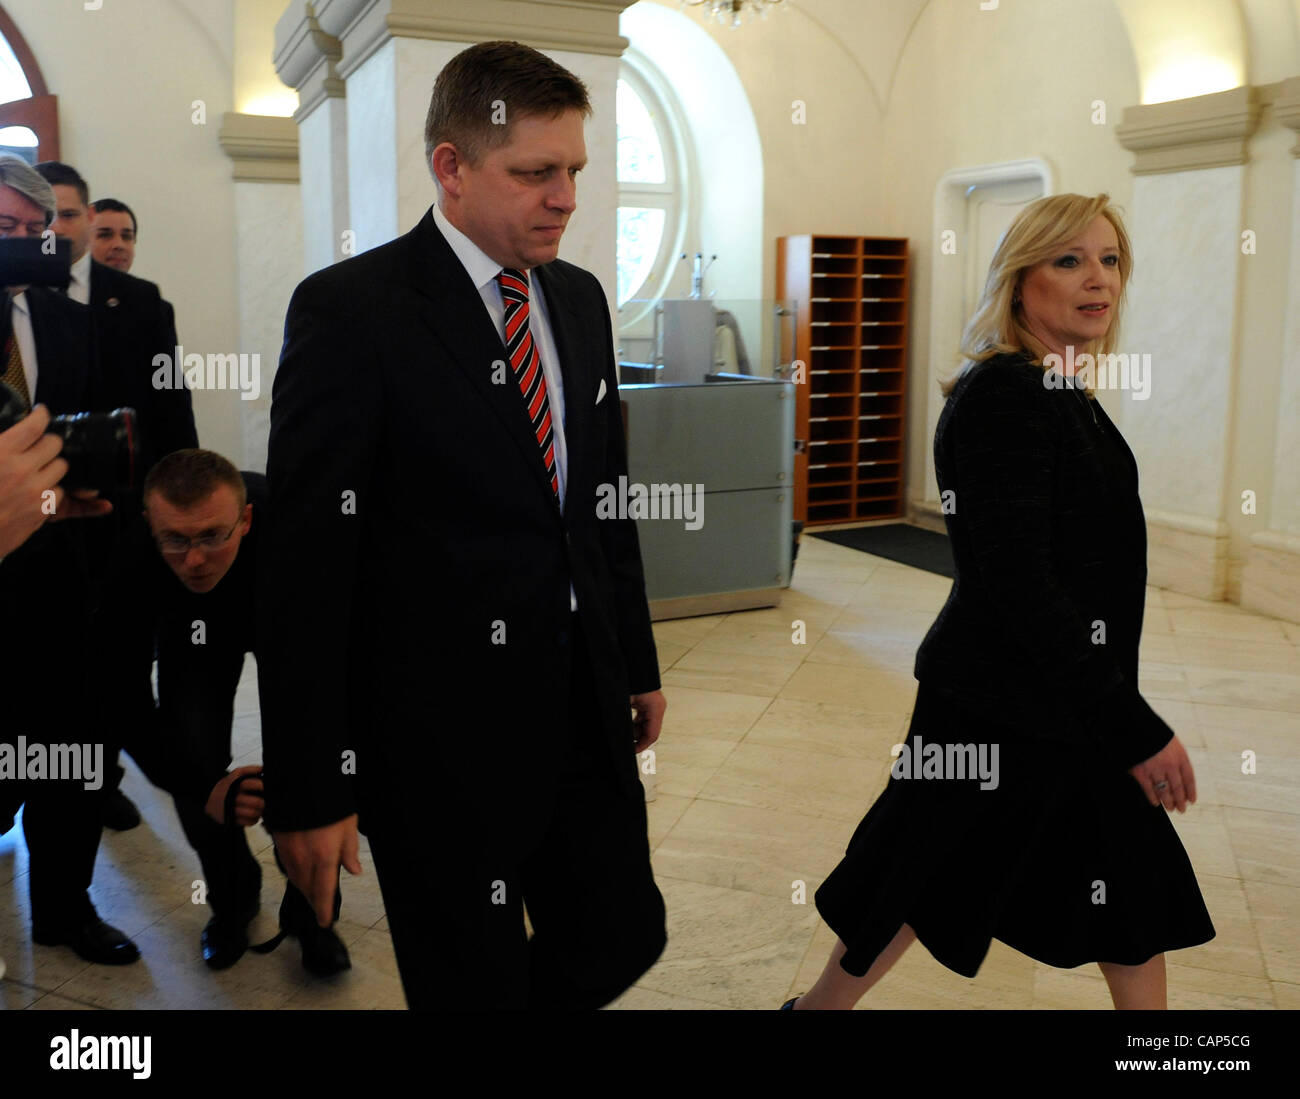 New Slovak Prime Minister Robert Fico, left, and his predecessor Iveta Radicova pose for photographs during a handover - Stock Image